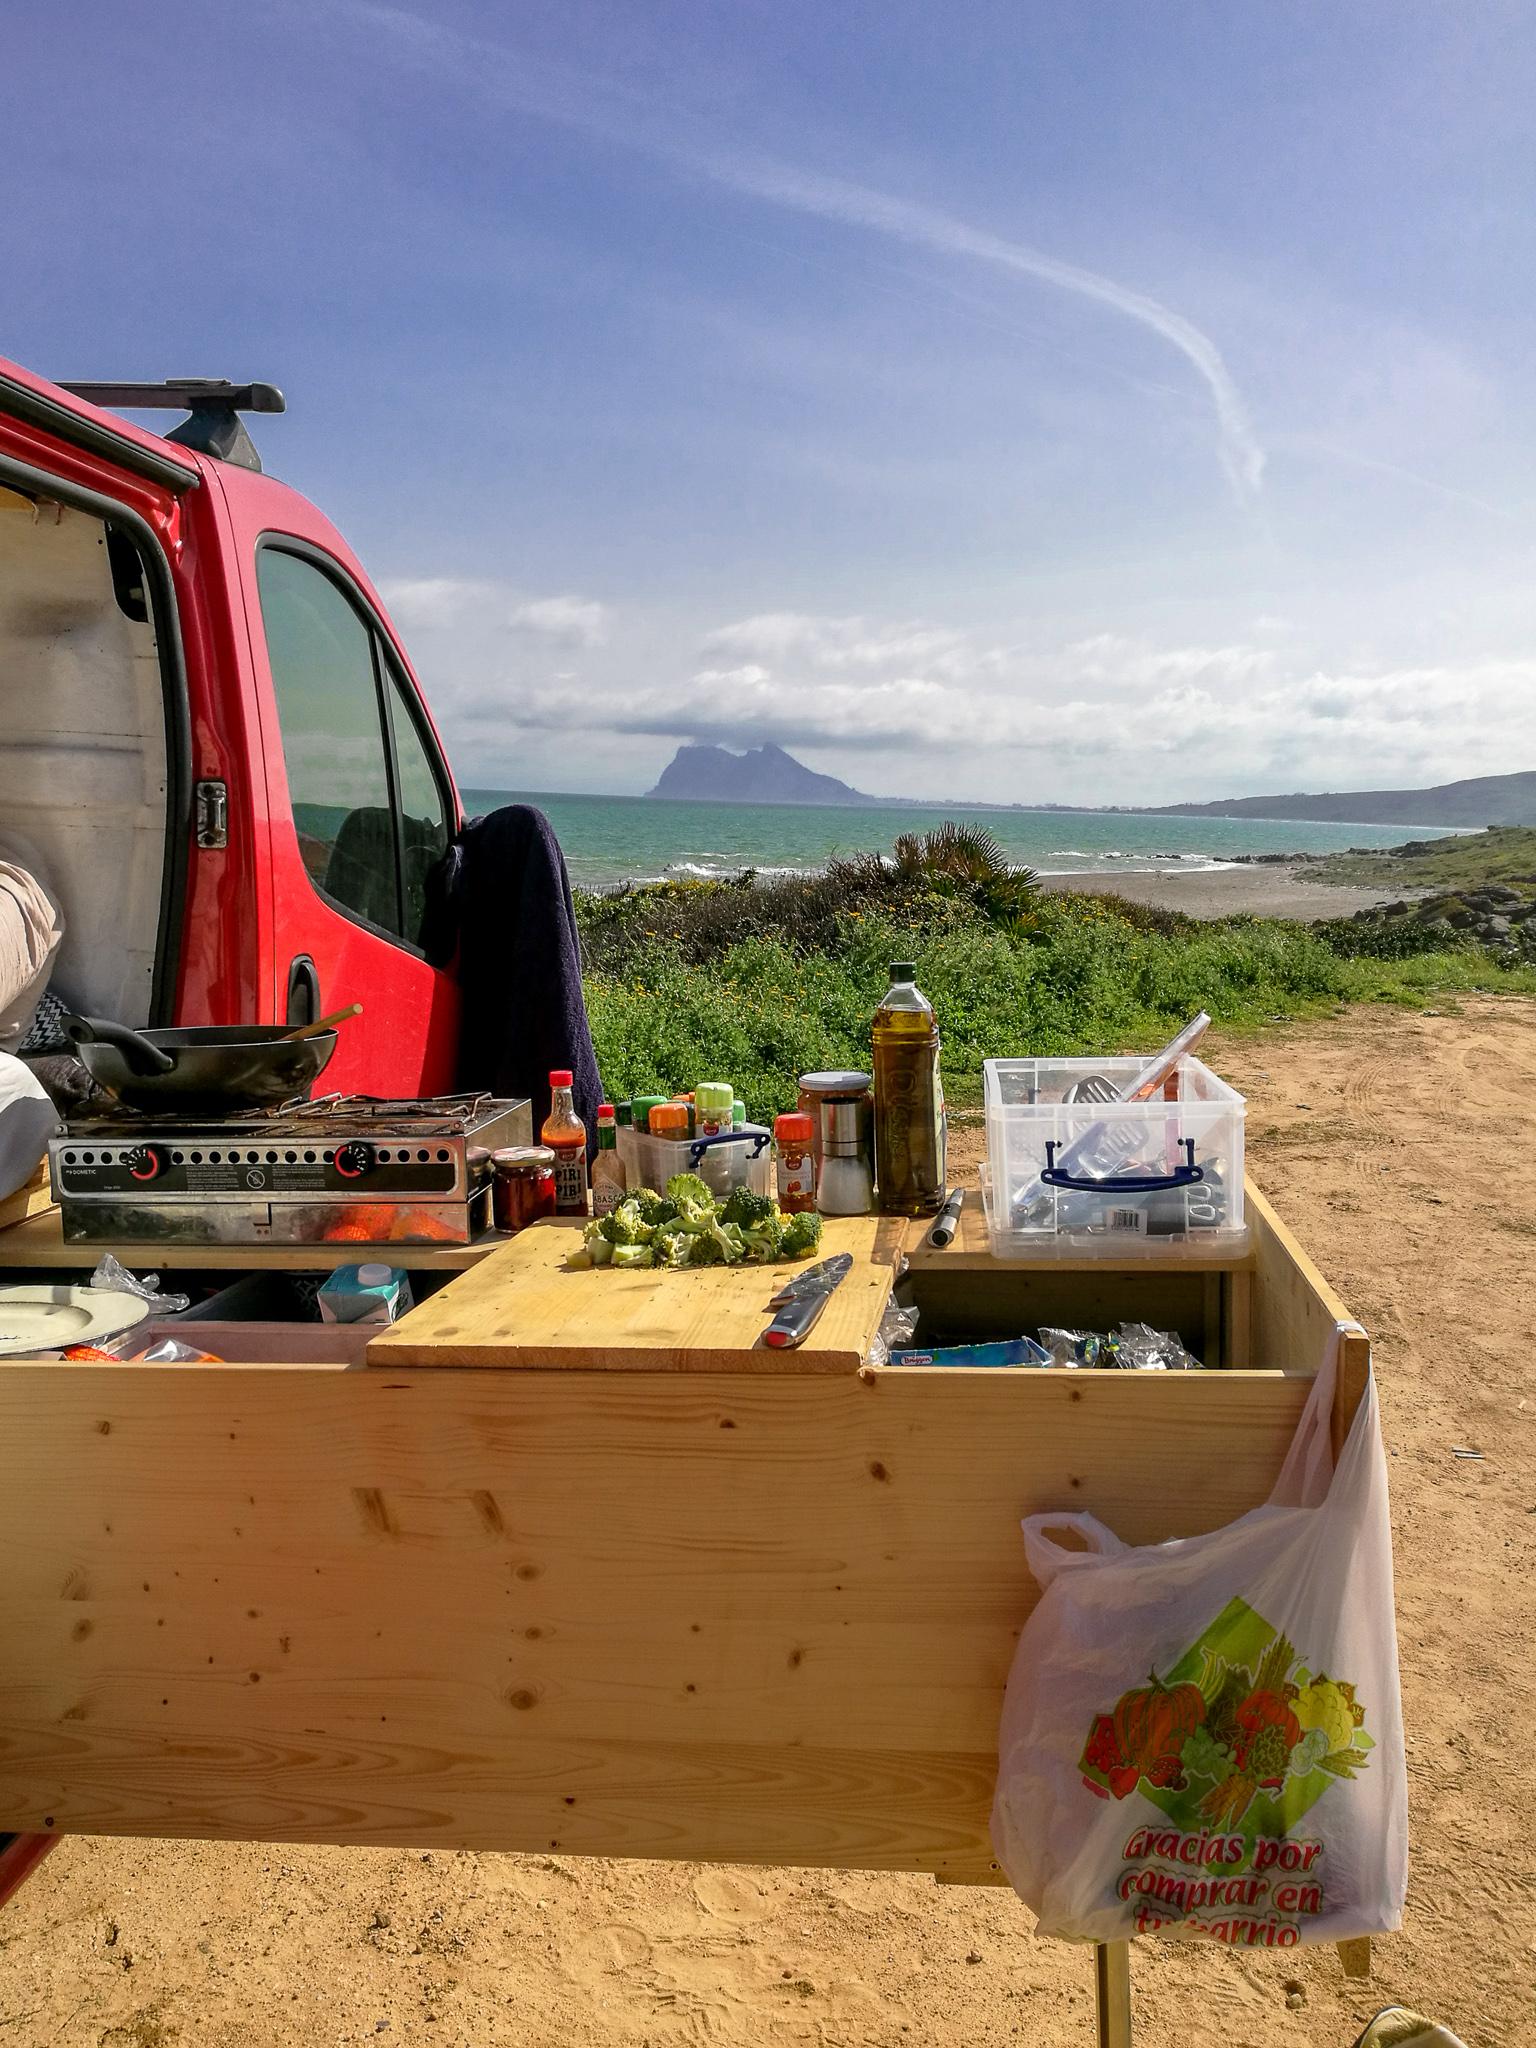 günstig-kochen-essen-reisen-rezeptideen-roadtrip